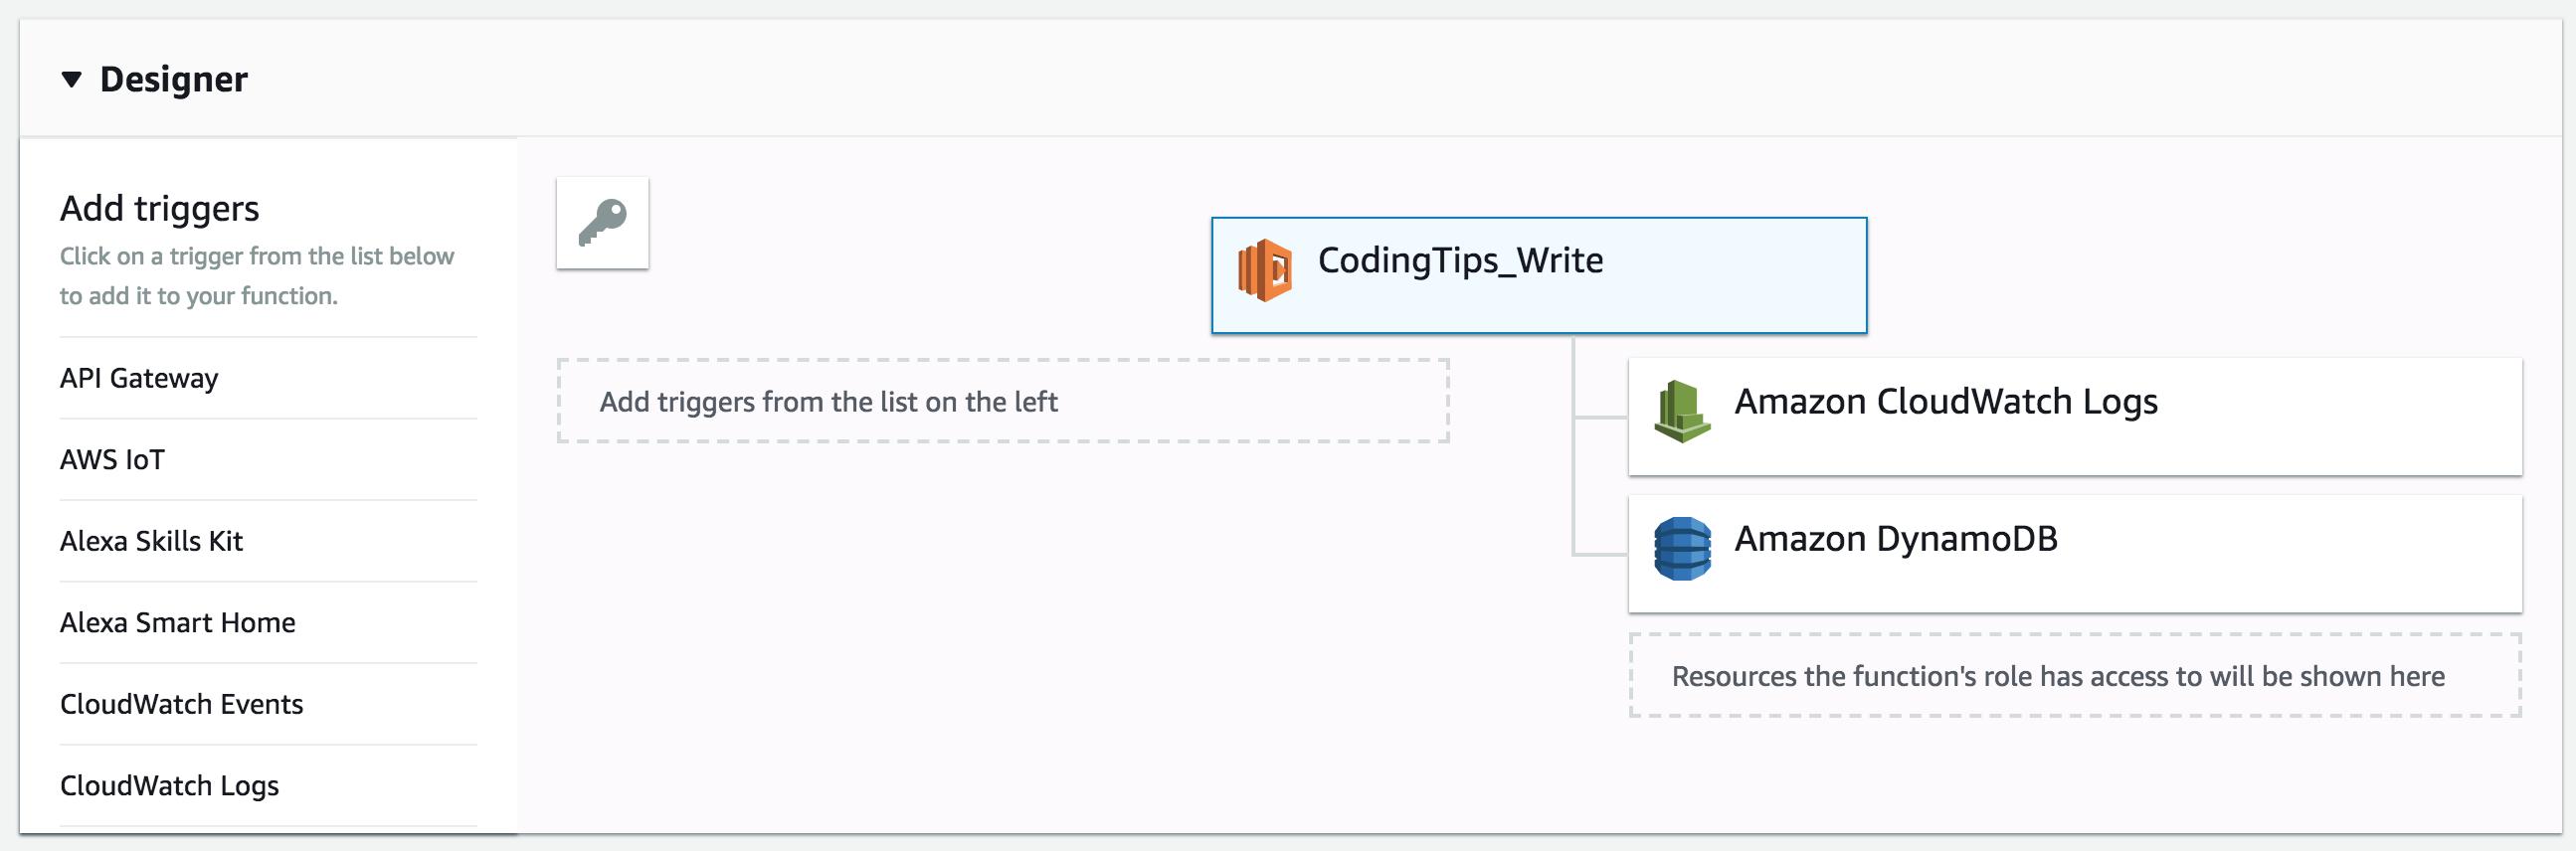 Create a Serverless Application with AWS Lambda and DynamoDB